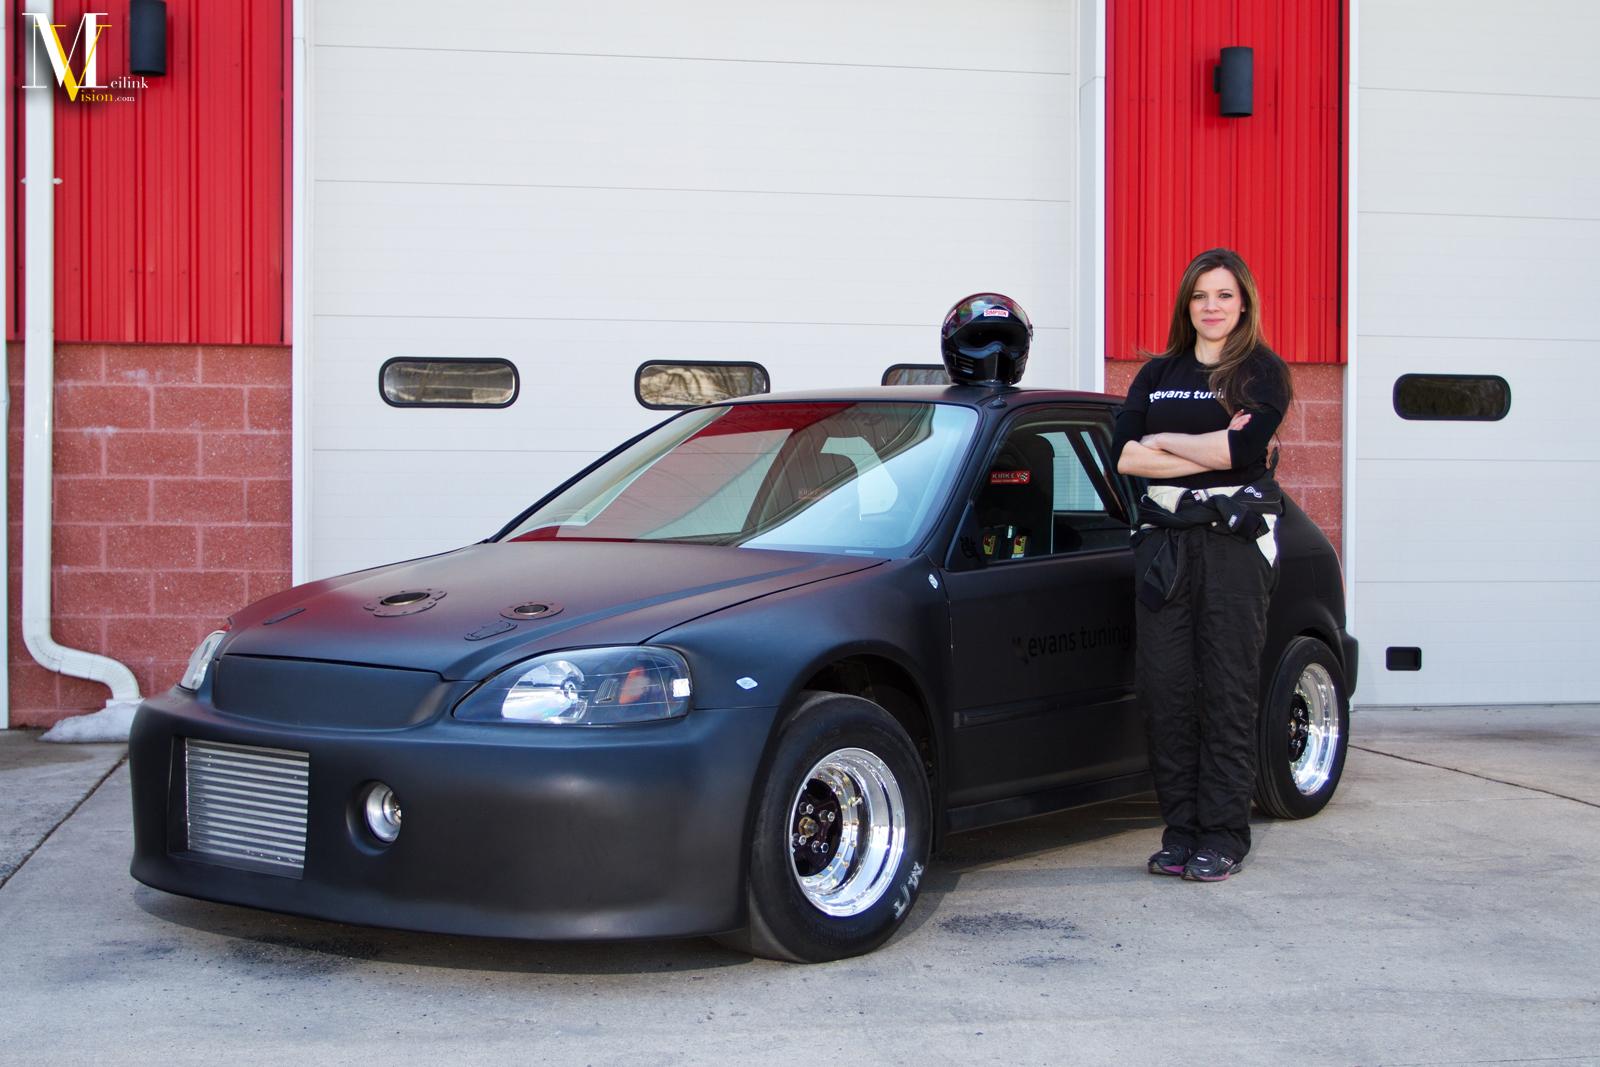 New Honda S2000 >> Unreleased: Evans Tuning Part 1: 1998 Honda Civic Hatch – www.meilinkvision.com